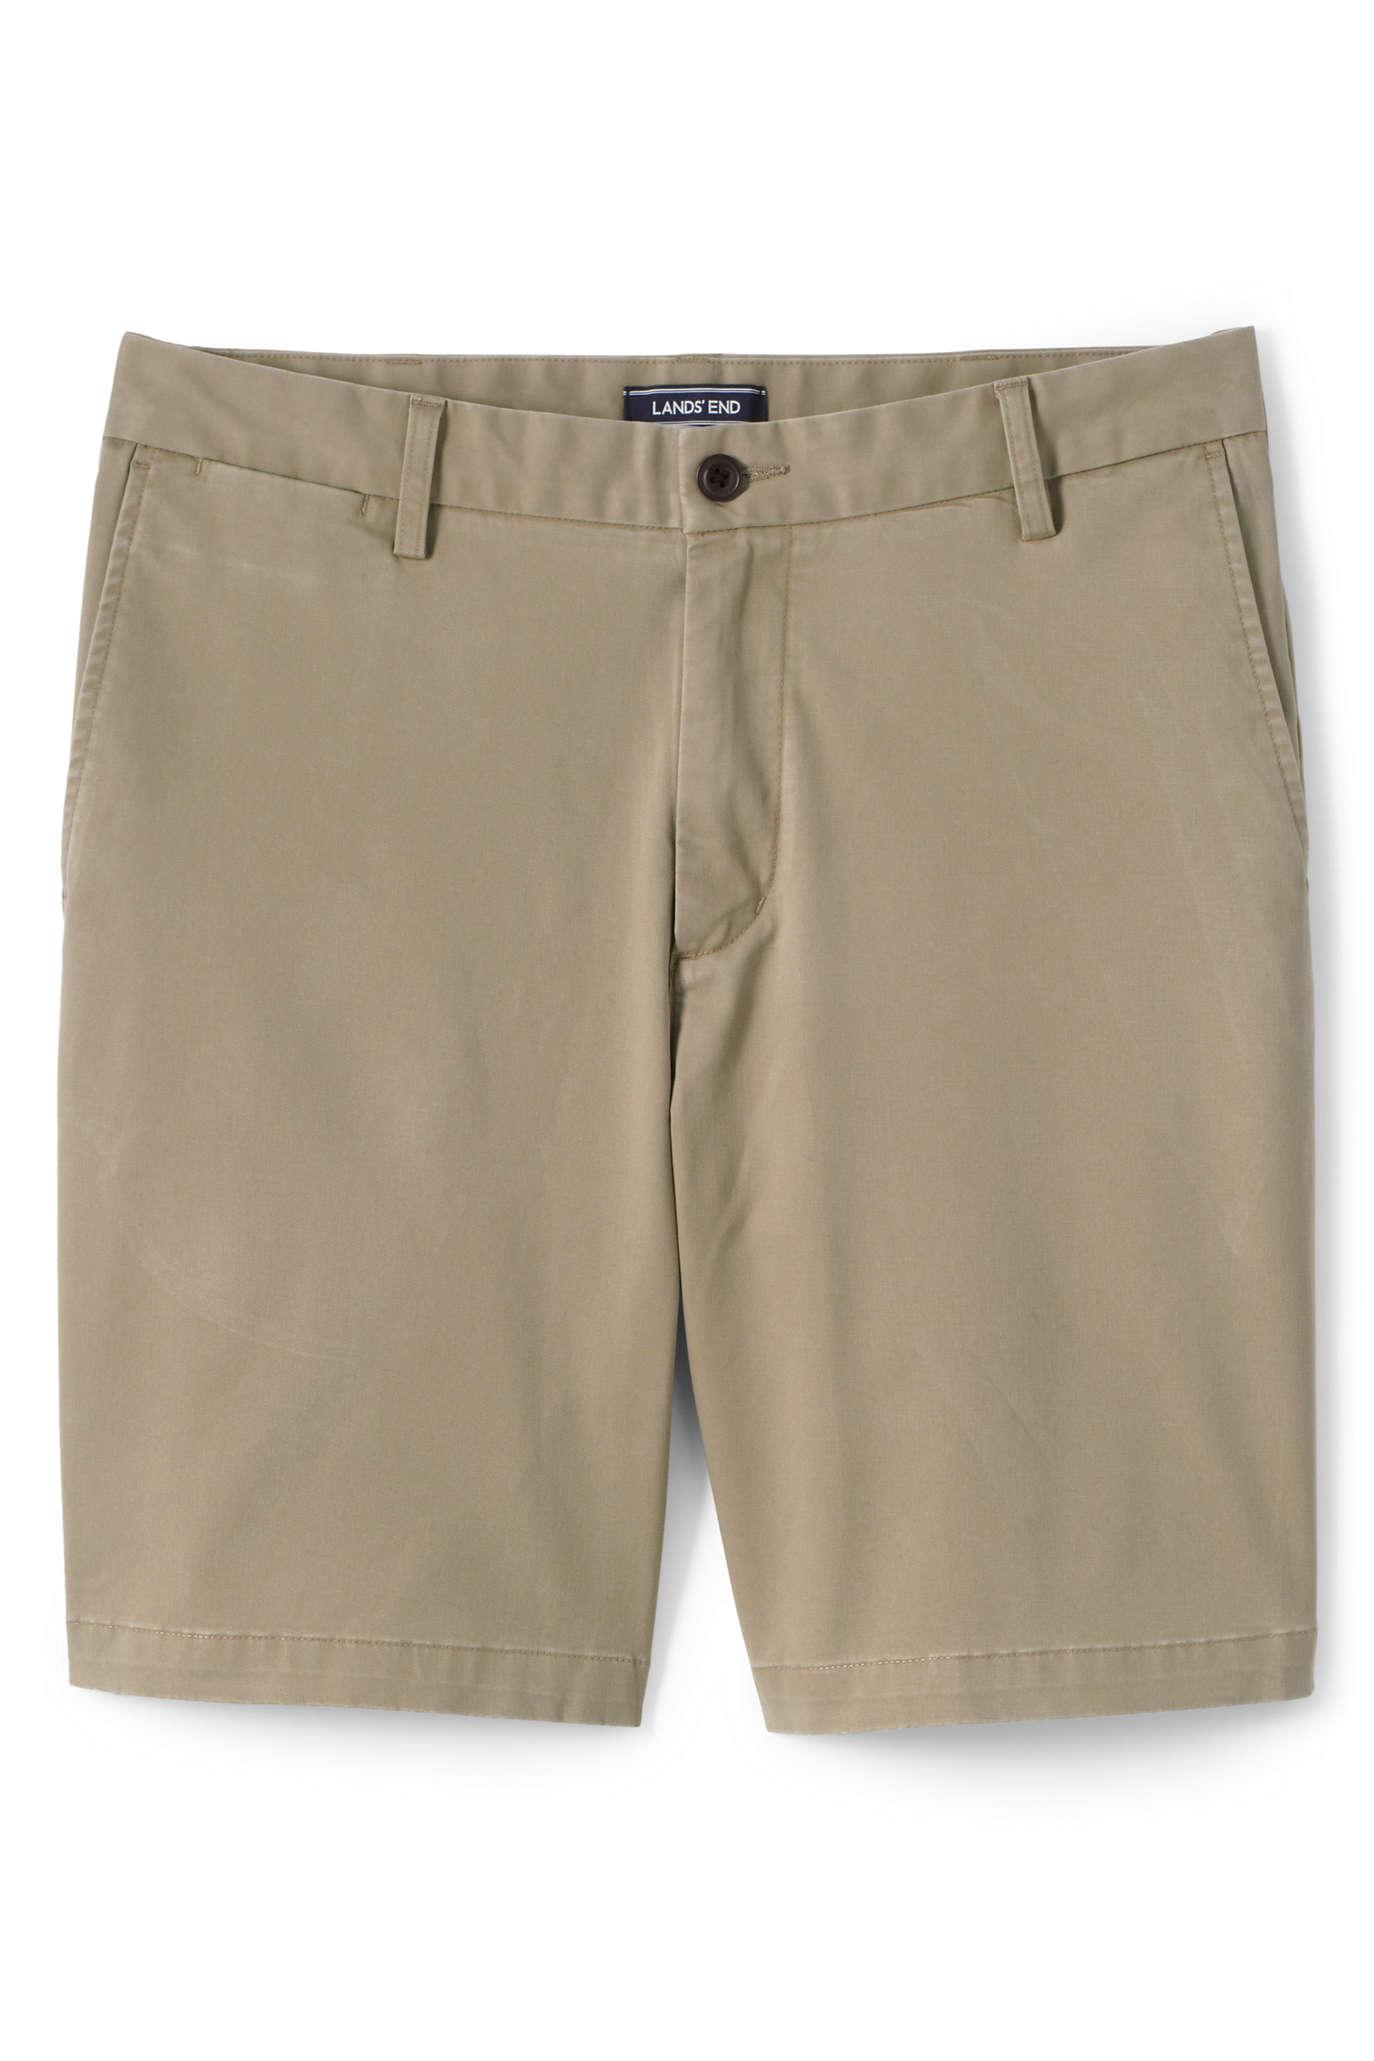 Men's 9 in. Chino Shorts